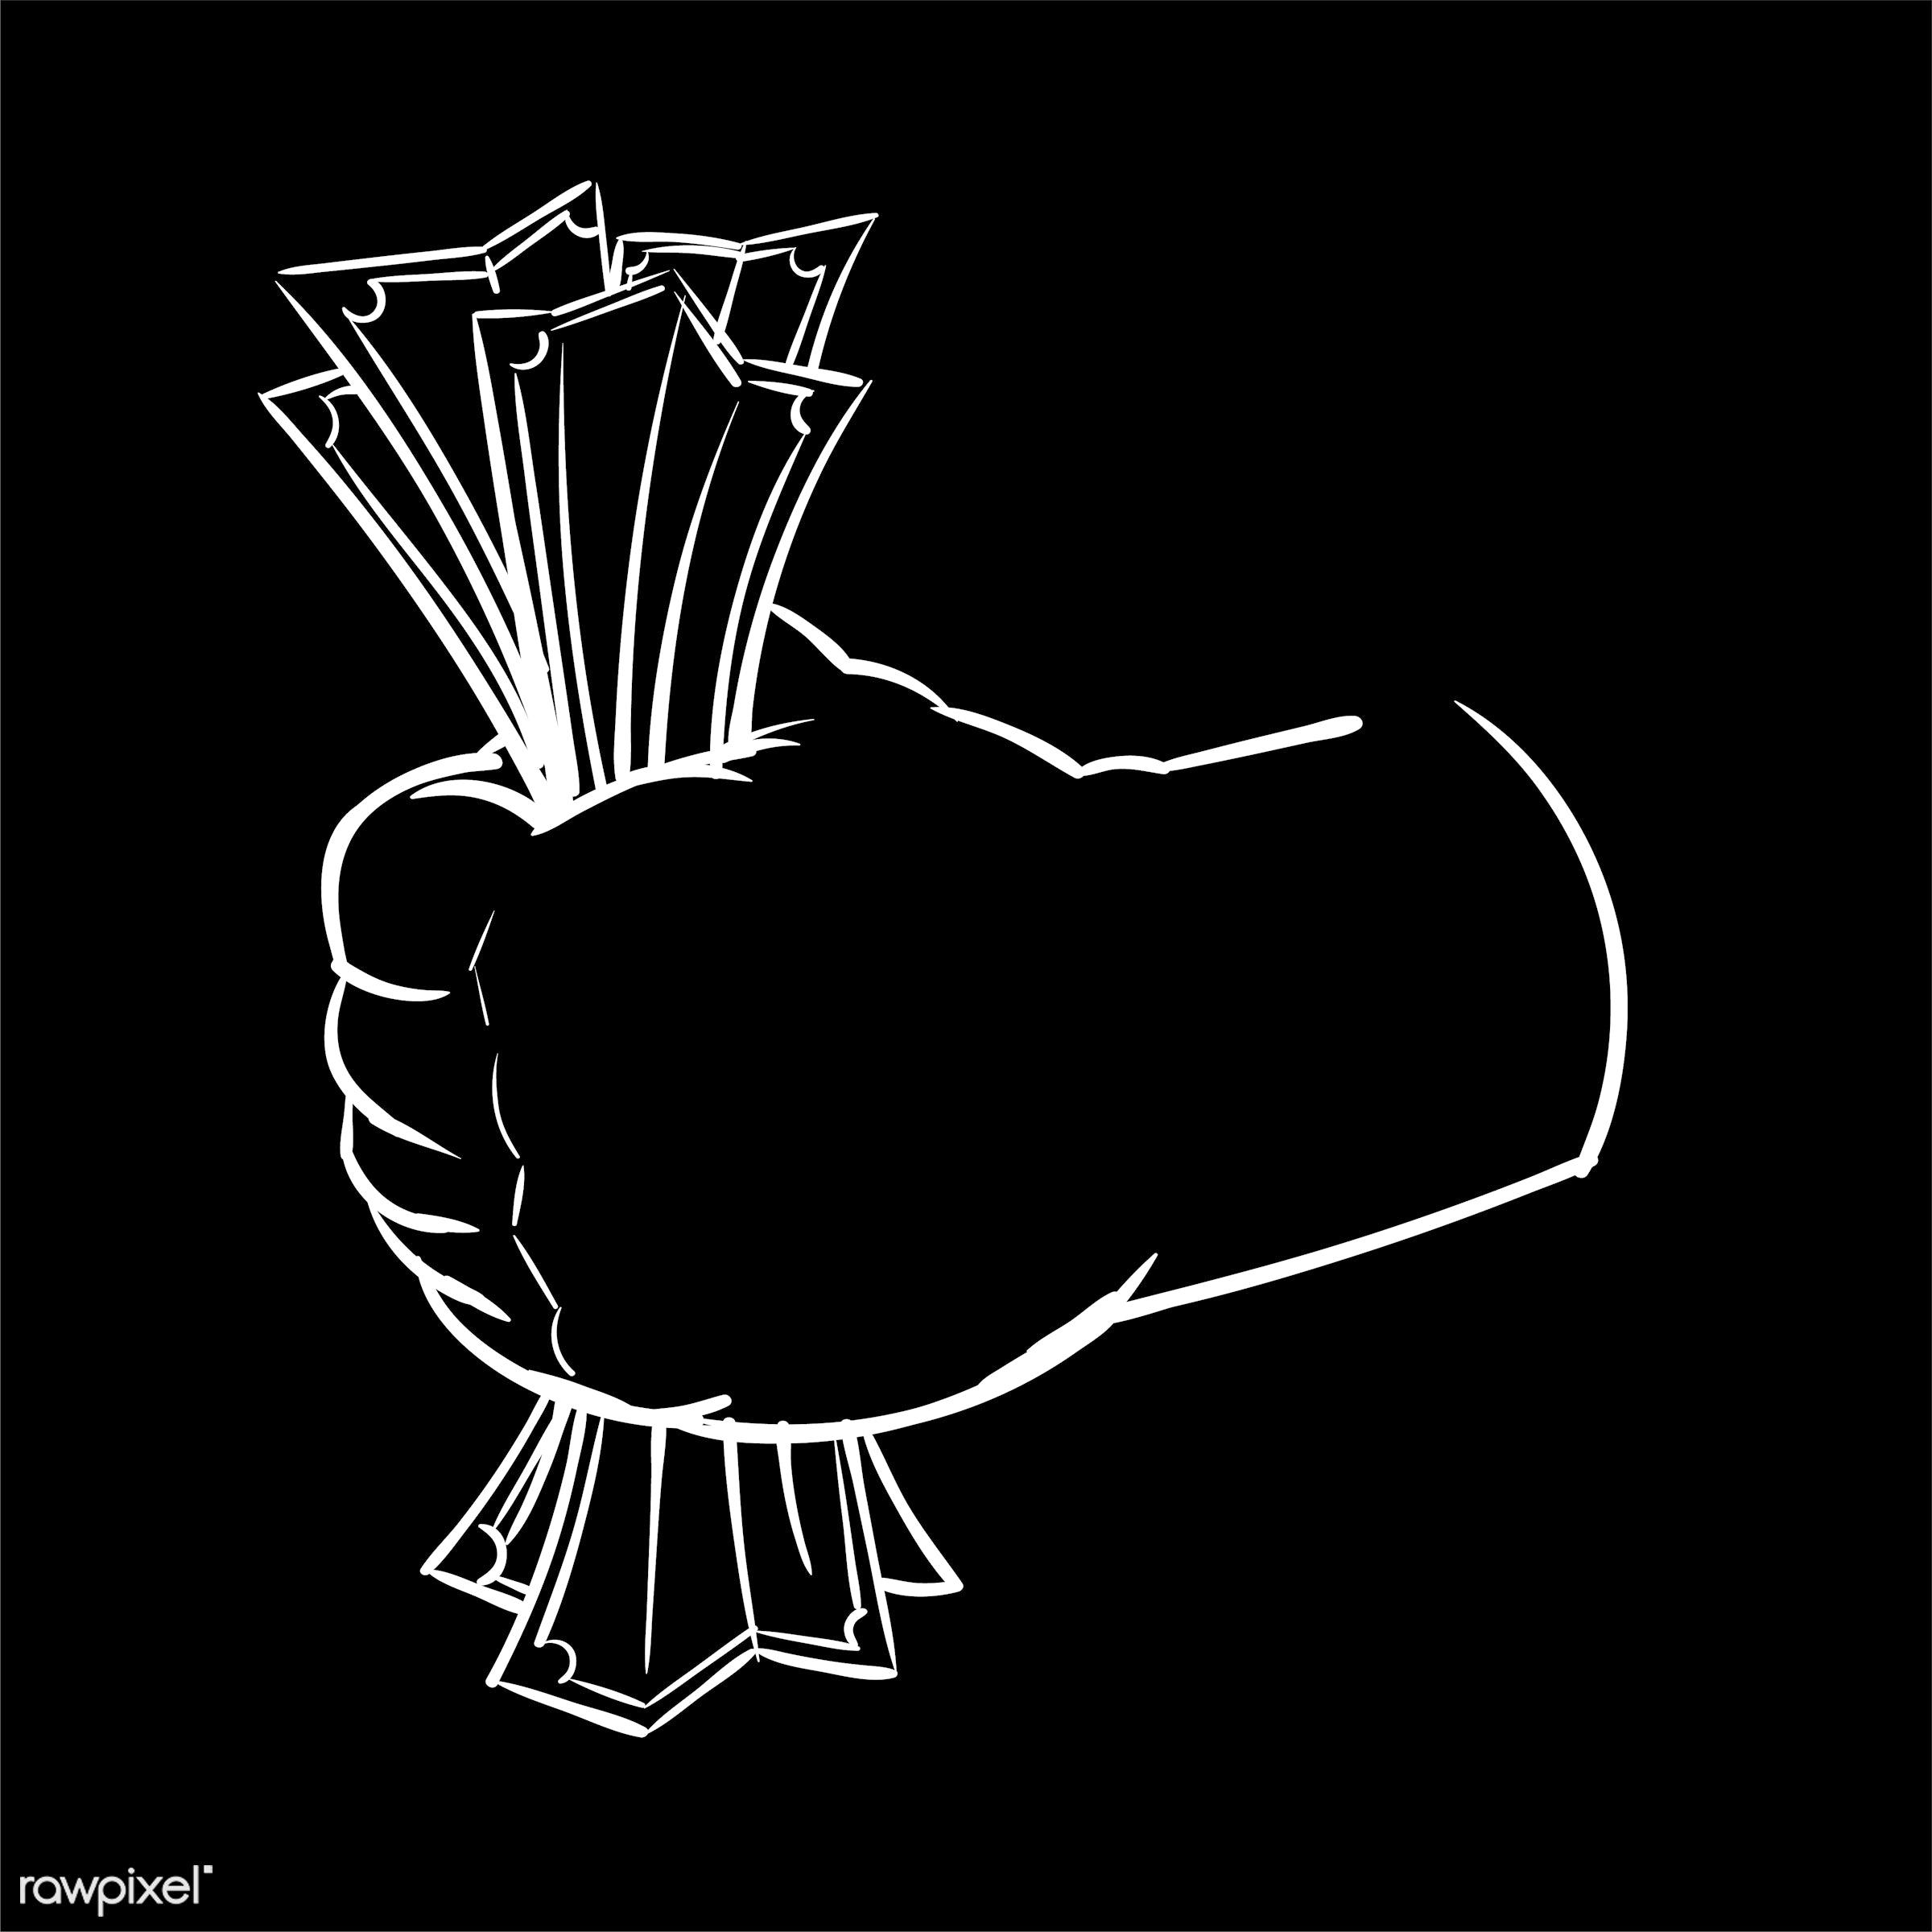 art, artwork, bills, business, cash, commerce, creative, creativity, design, draw, drawing, drawn, economic, economy,...